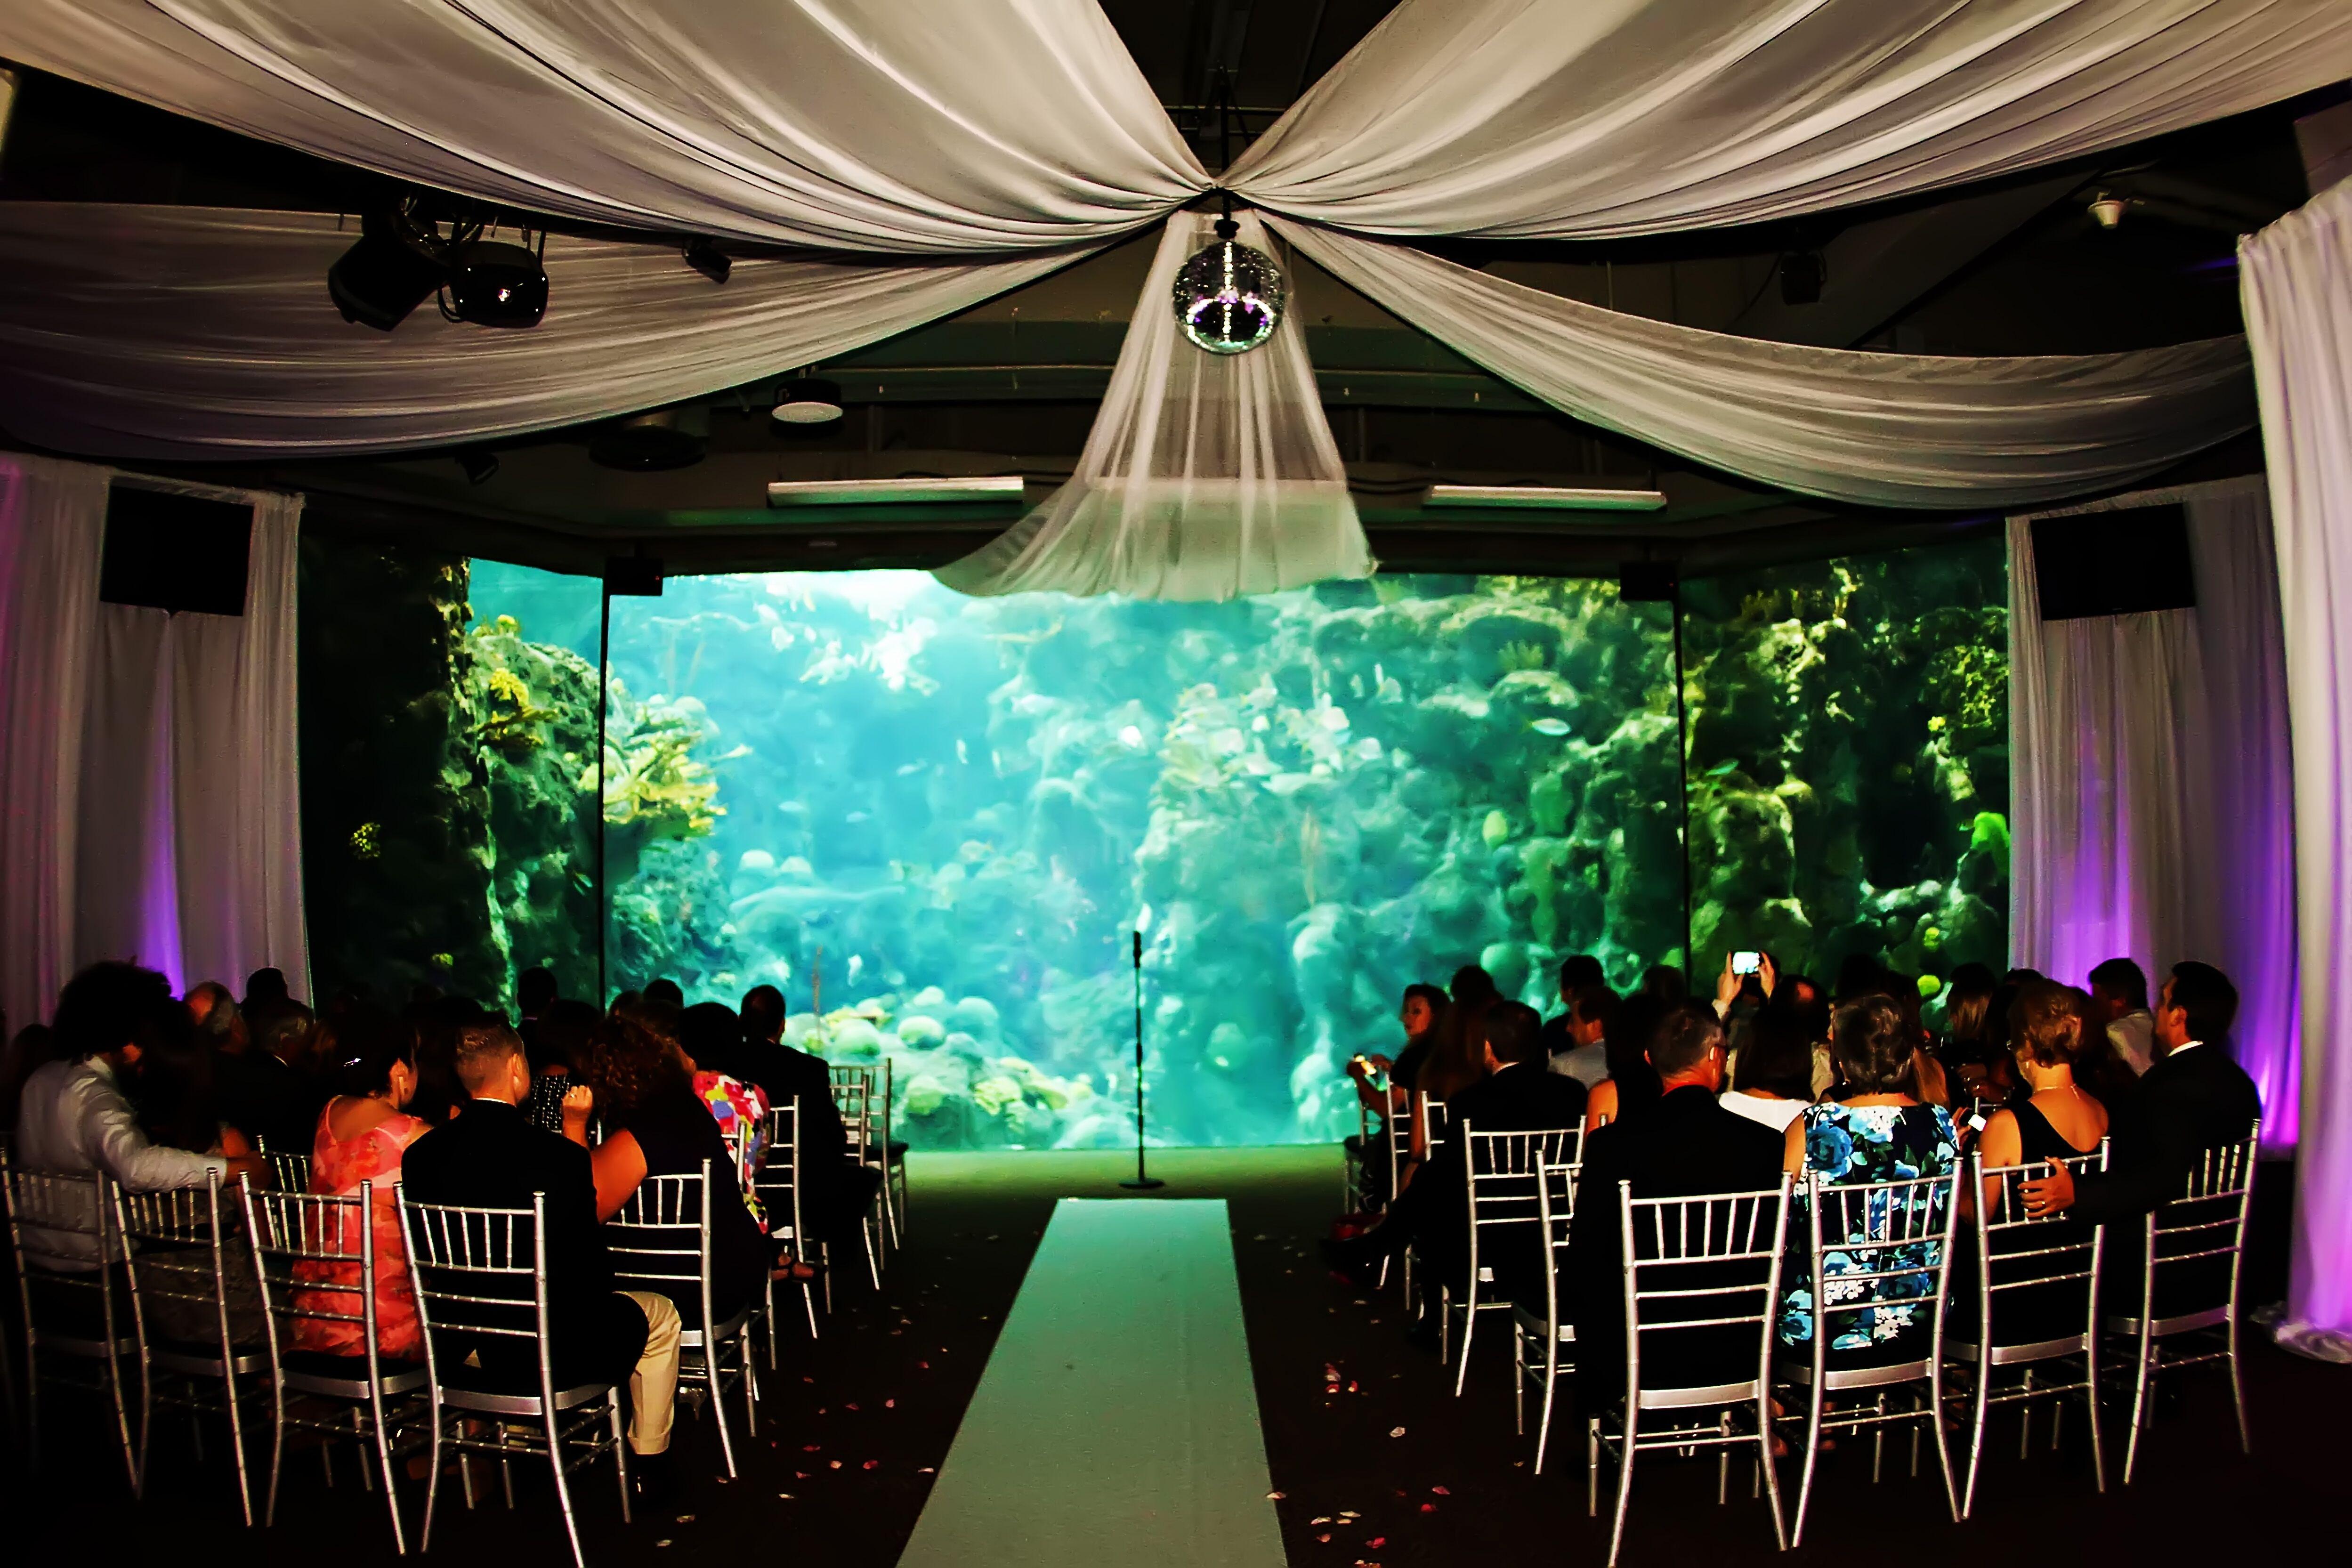 Florida Beach Wedding With Aquarium Reception: Aquatic Wedding Venue